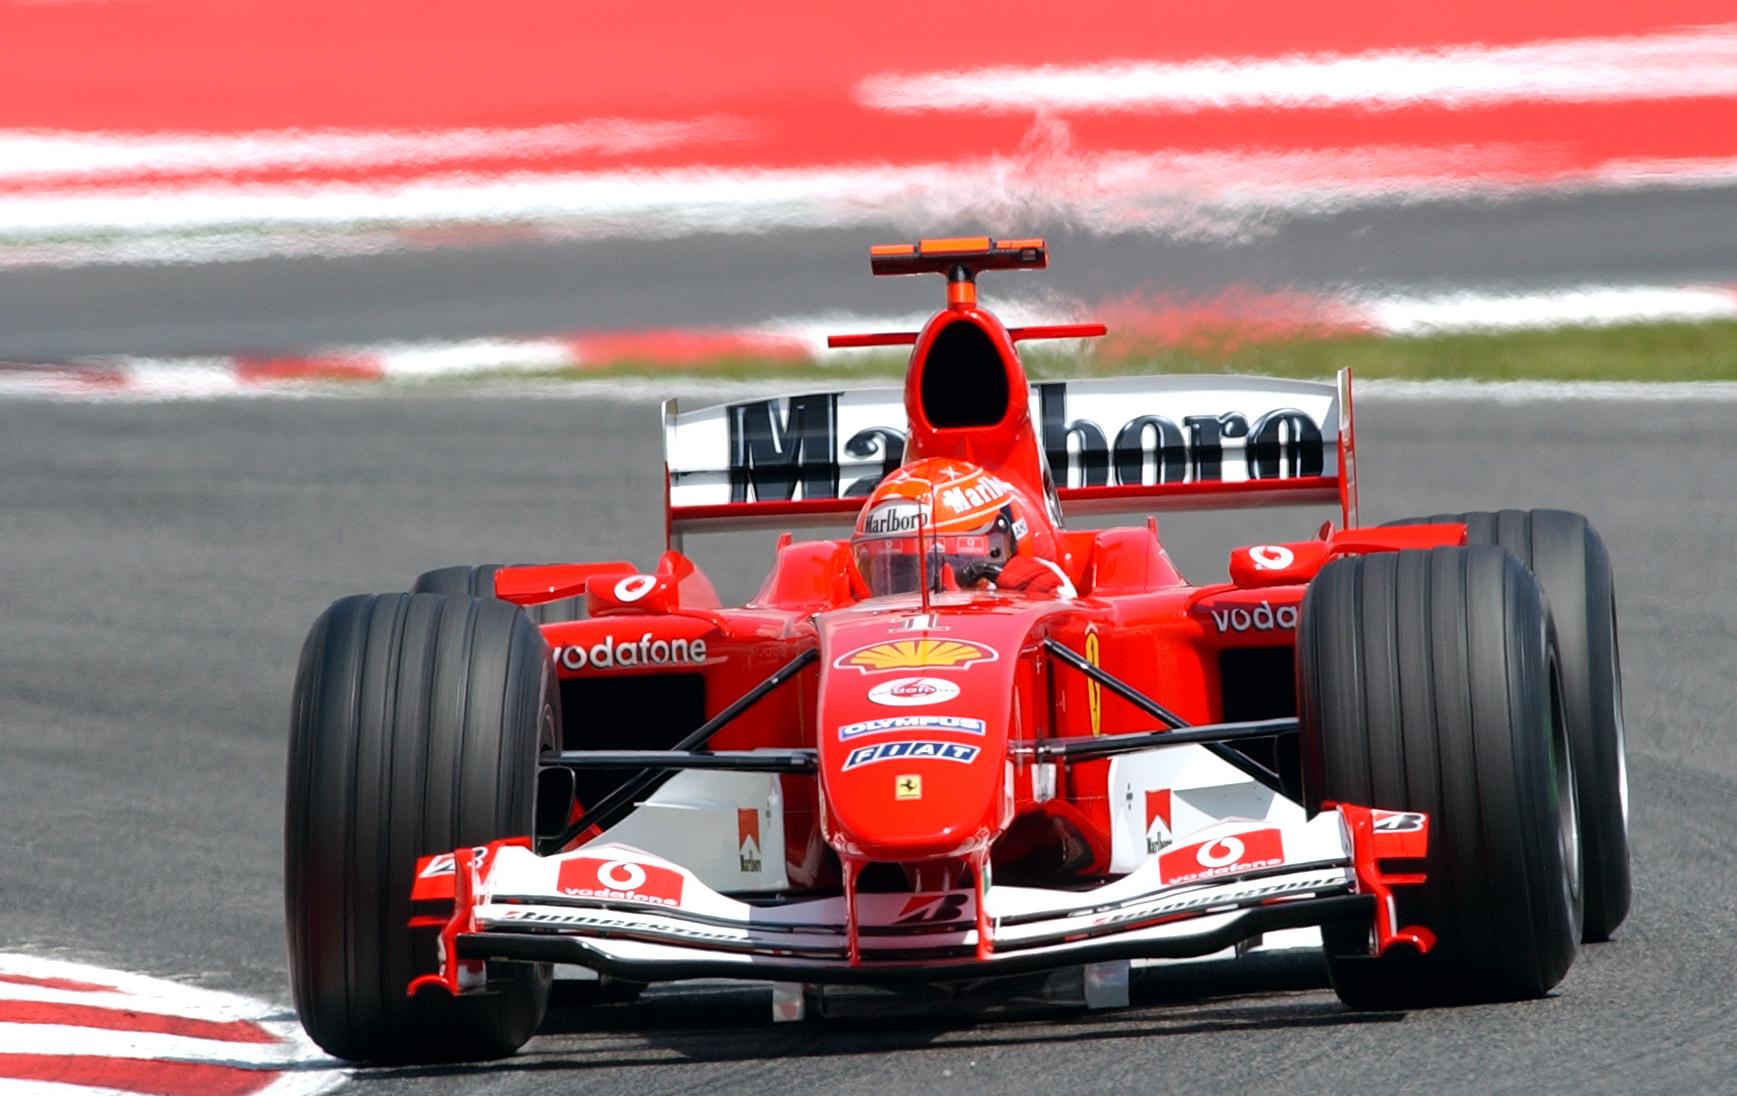 Photographie Formule 1 Life Views Photography